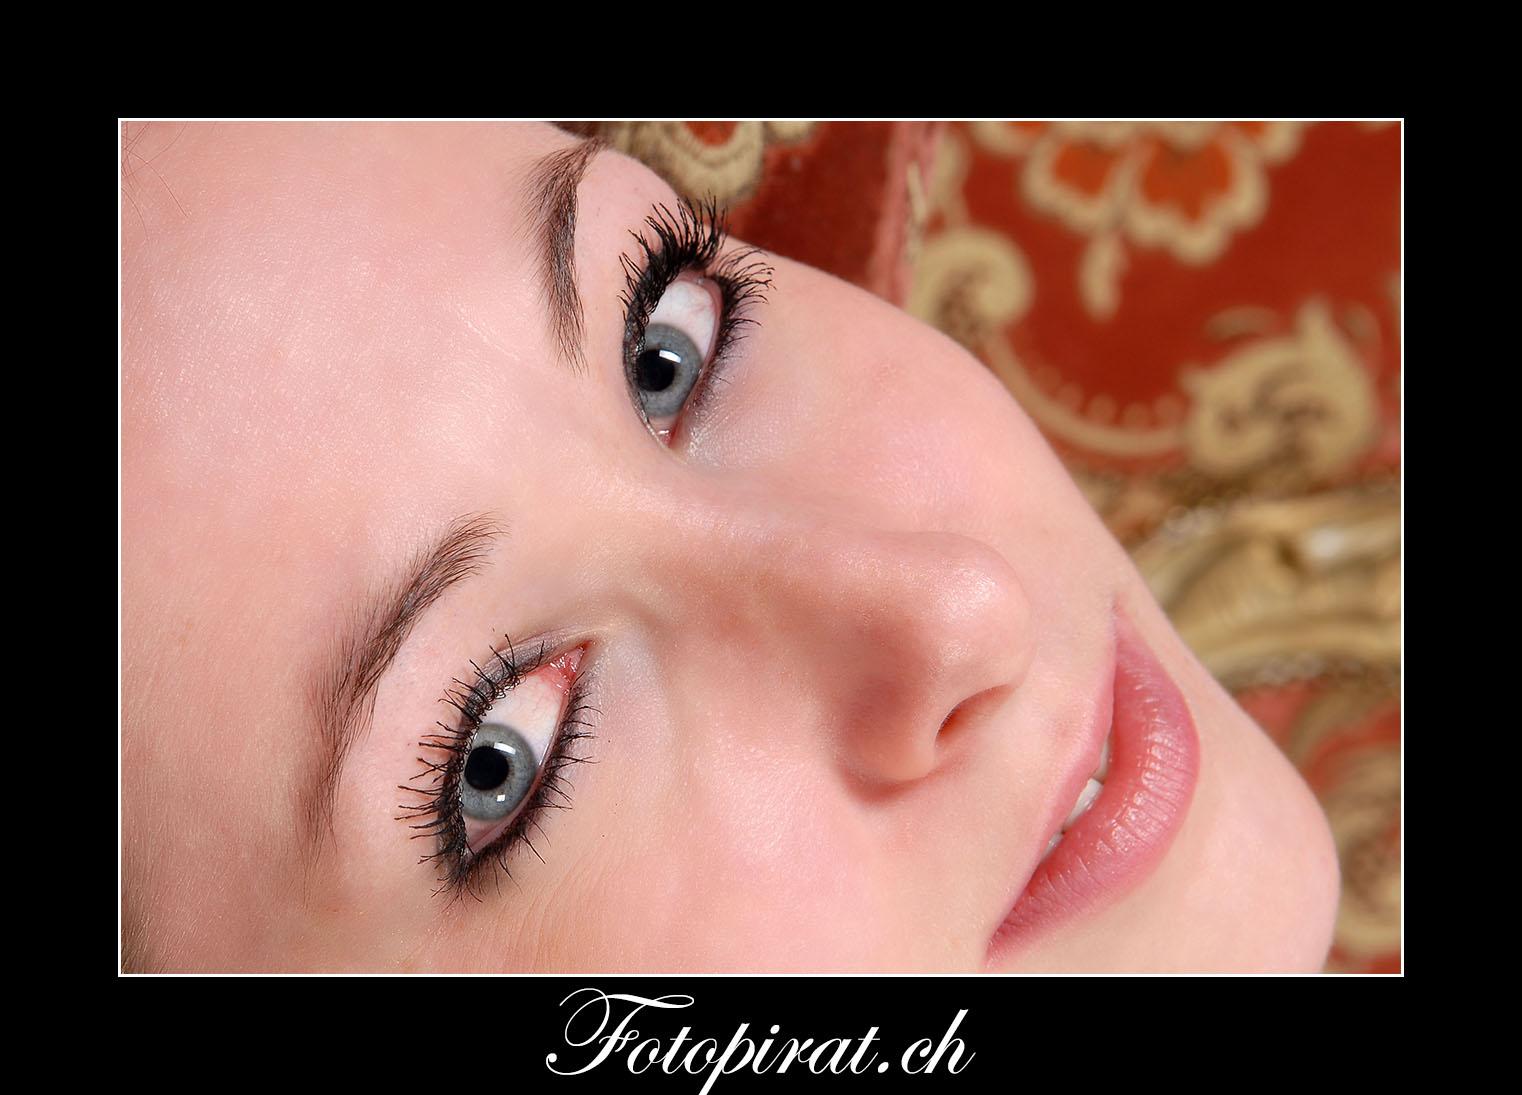 Fotoshooting, On Location, schöne Augen, Modelagentur, Sportmodel, Barock, Fotomodel